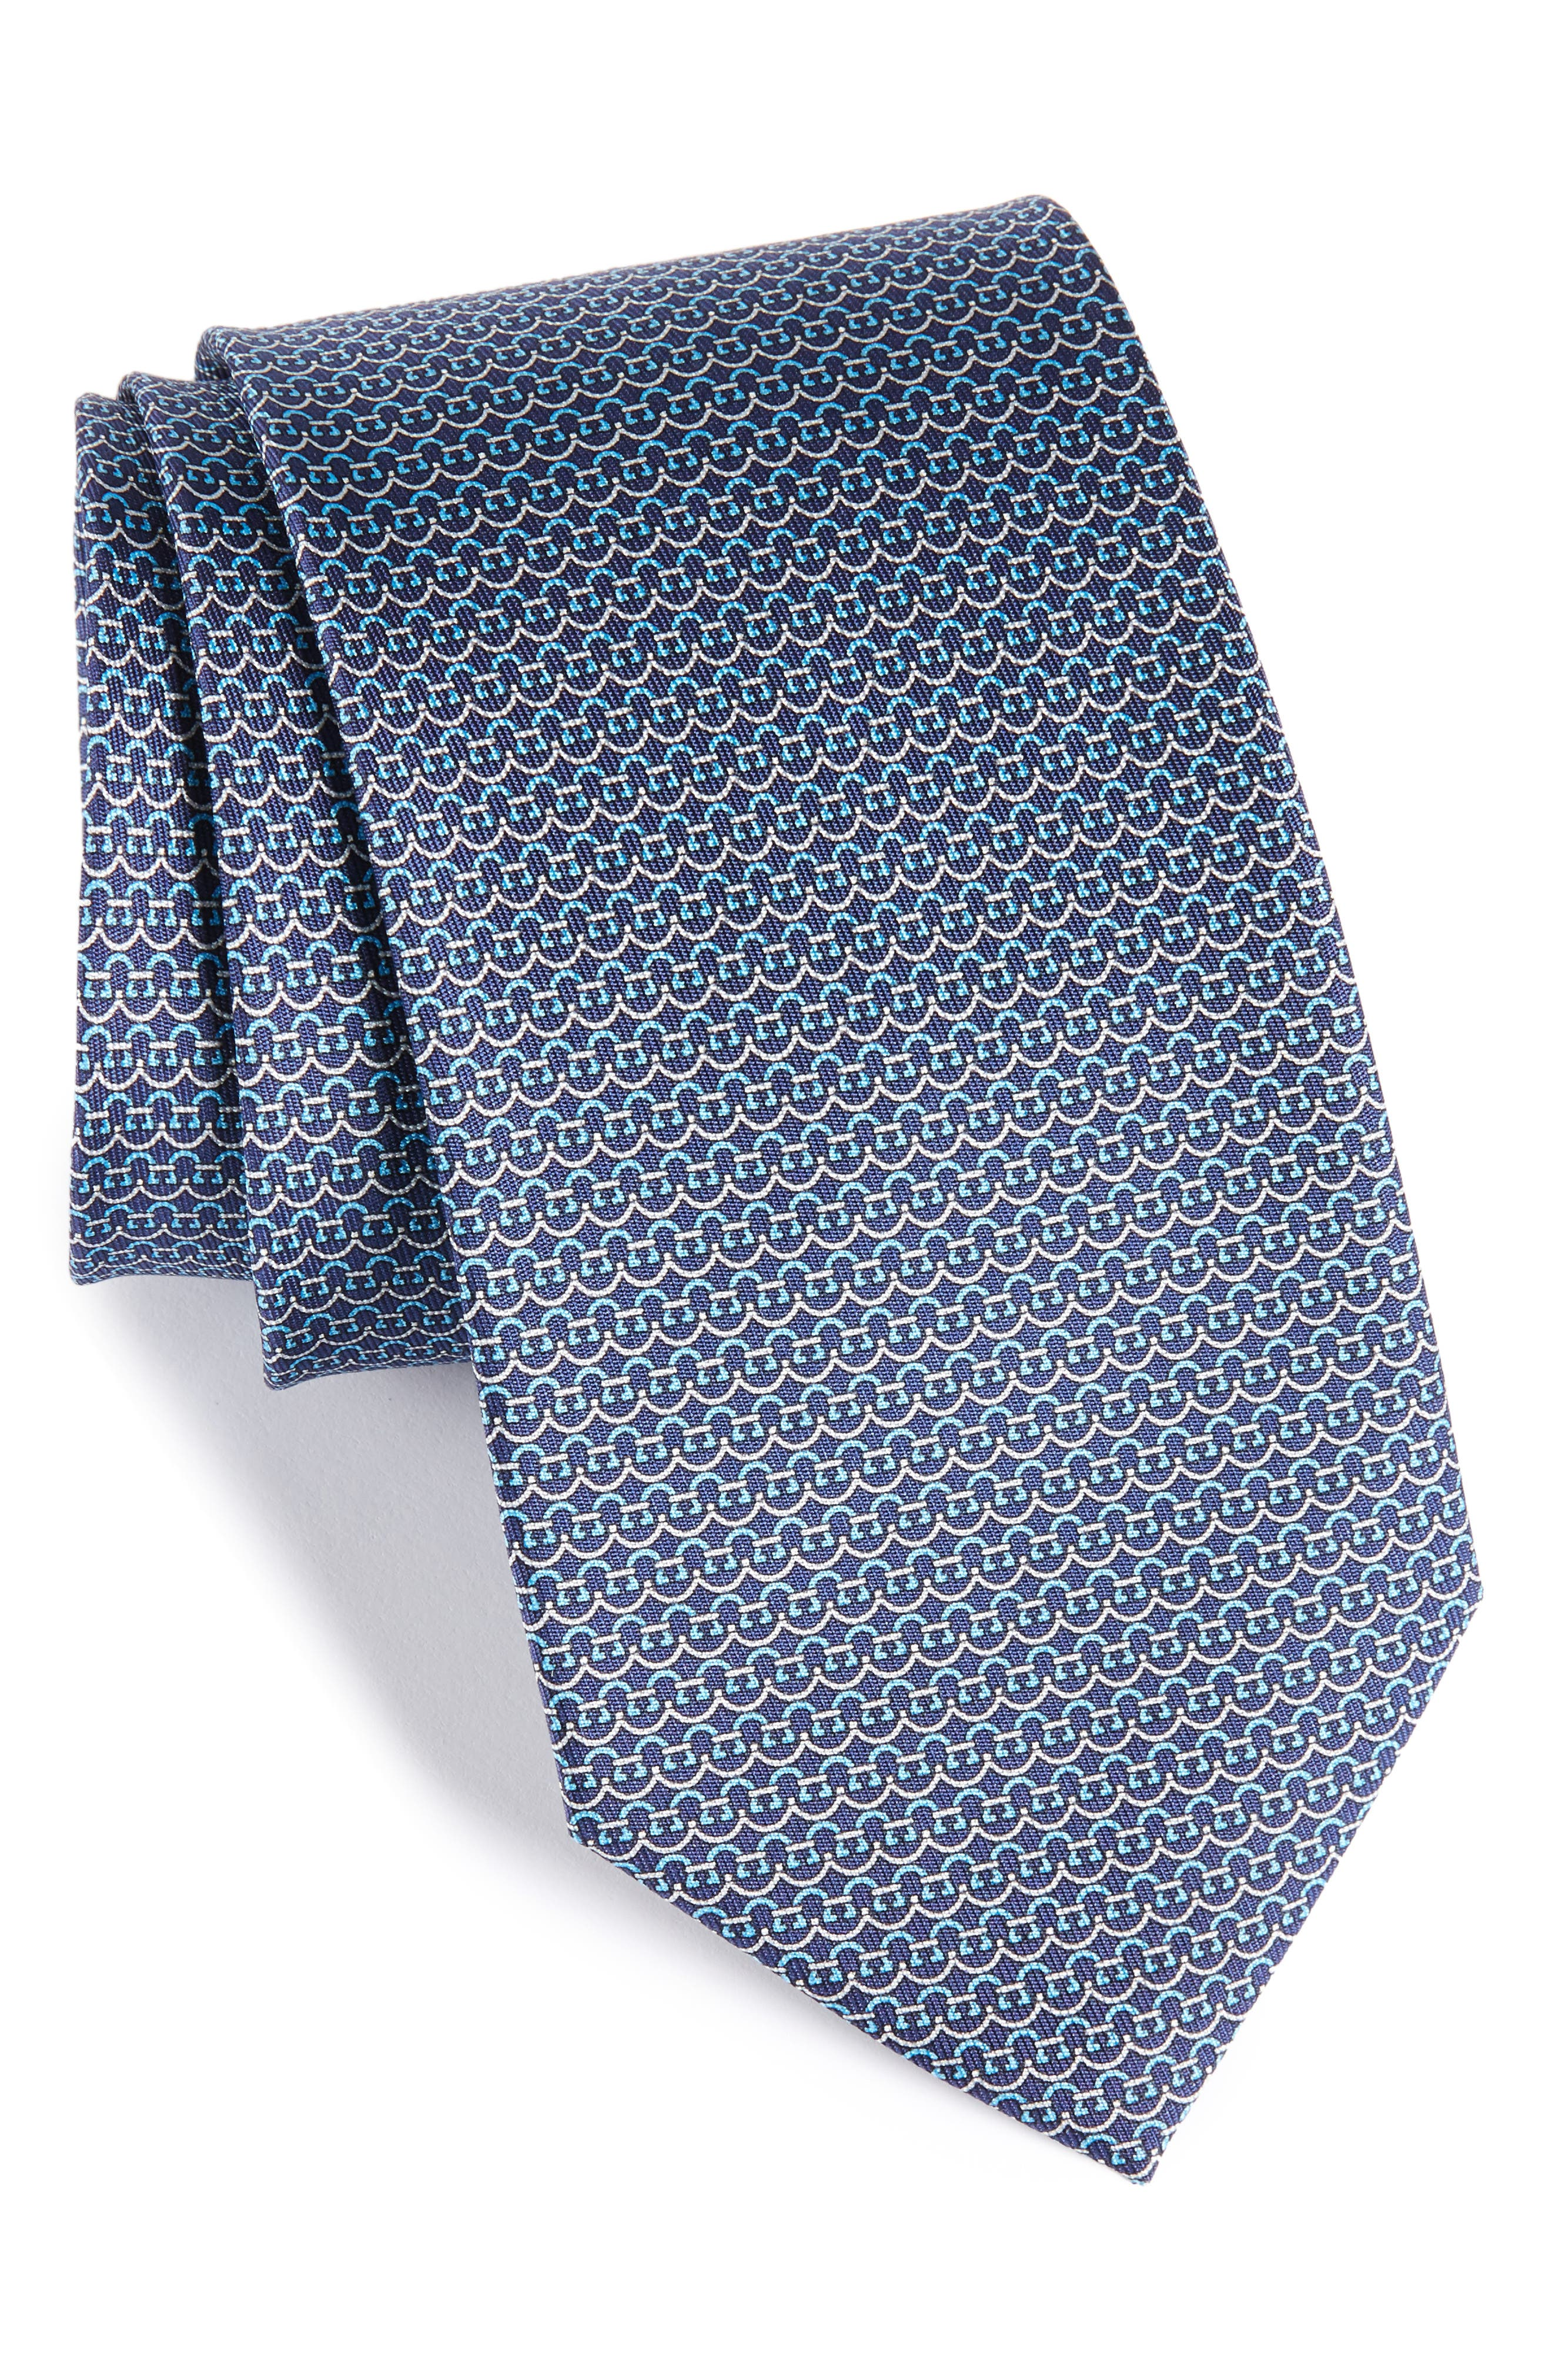 Alternate Image 1 Selected - Salvatore Ferragamo Gancini Silk Tie